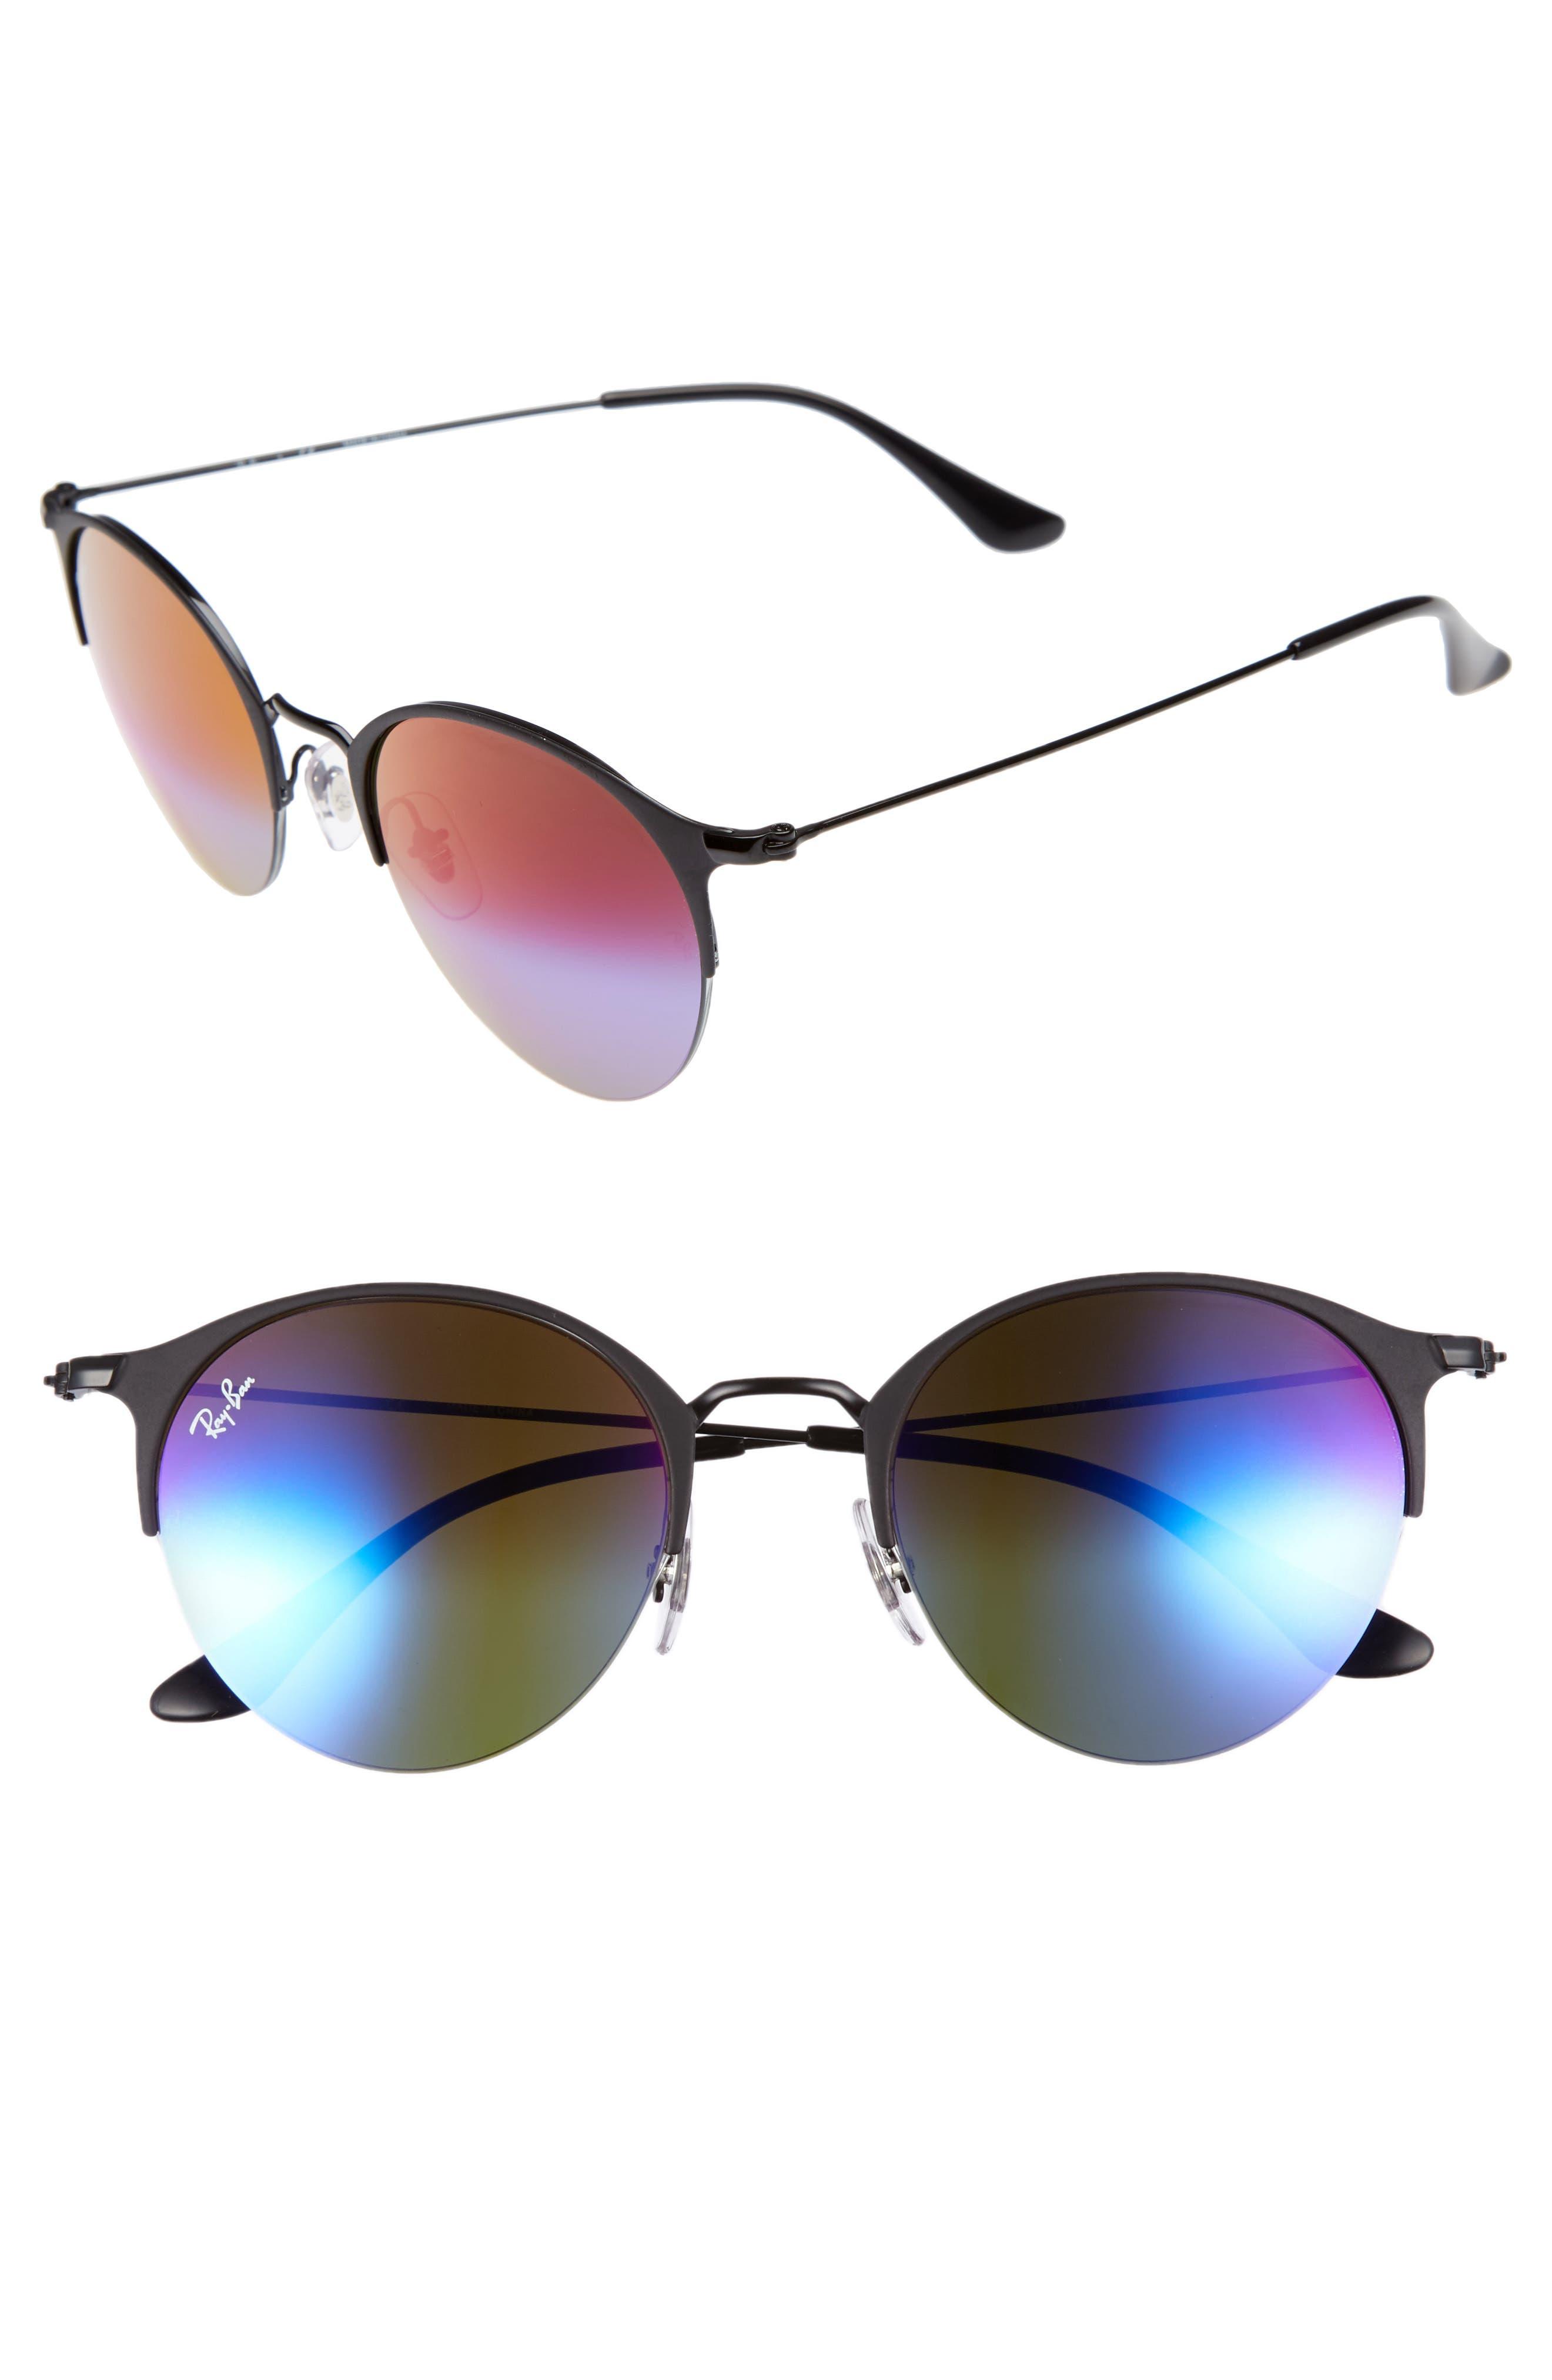 50mm Gradient Mirrored Sunglasses,                         Main,                         color, 001